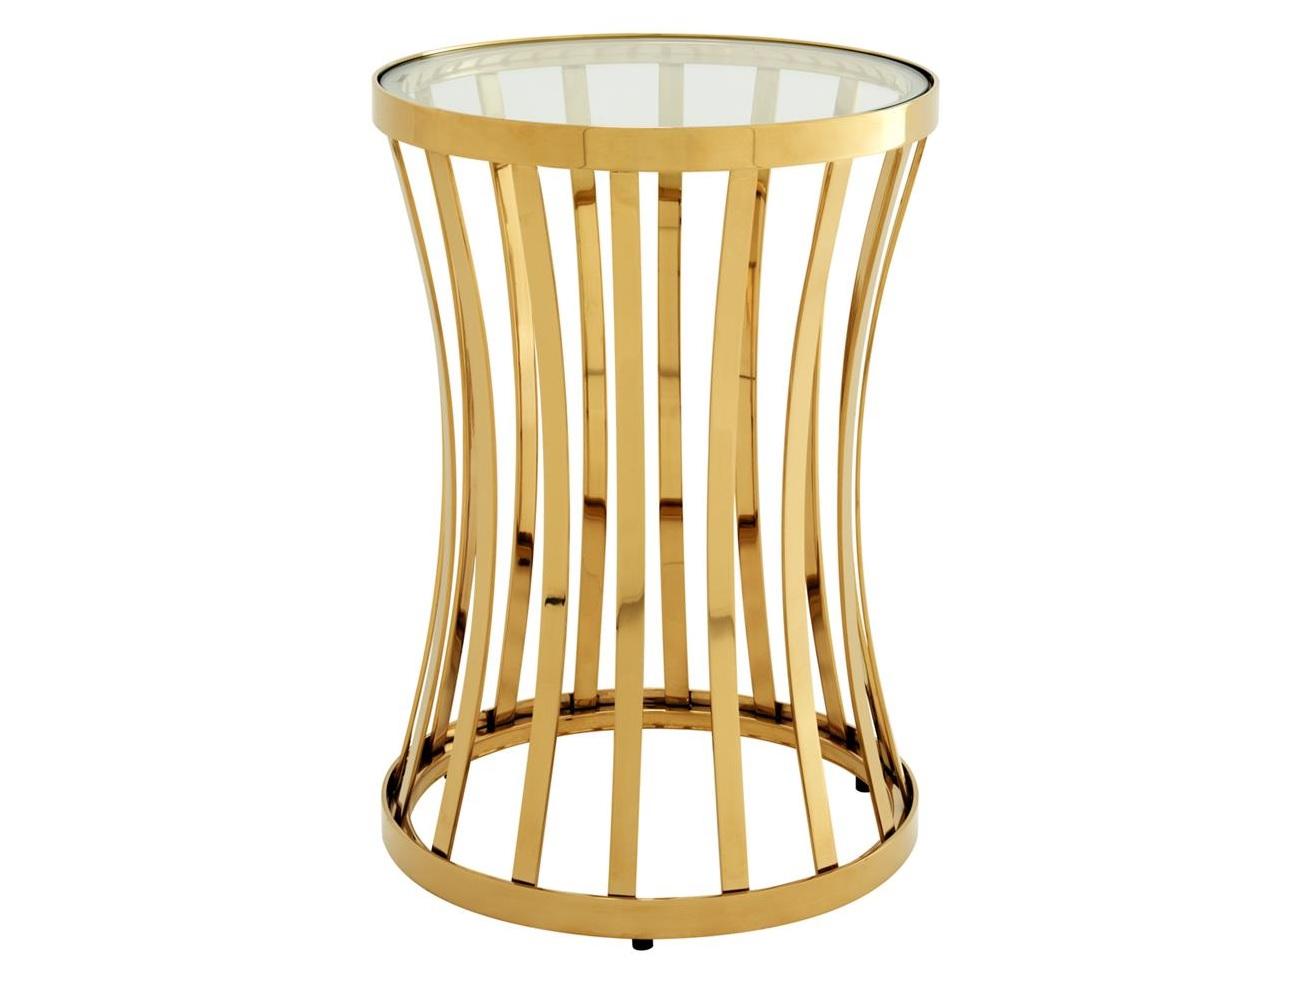 Столик Side Table ChiltonПриставные столики<br>Столик &amp;quot;Side Table Chilton&amp;quot; выполнен из металла золотого цвета. Столешница из плотного прозрачного стекла.<br><br>Material: Металл<br>Height см: 59<br>Diameter см: 40